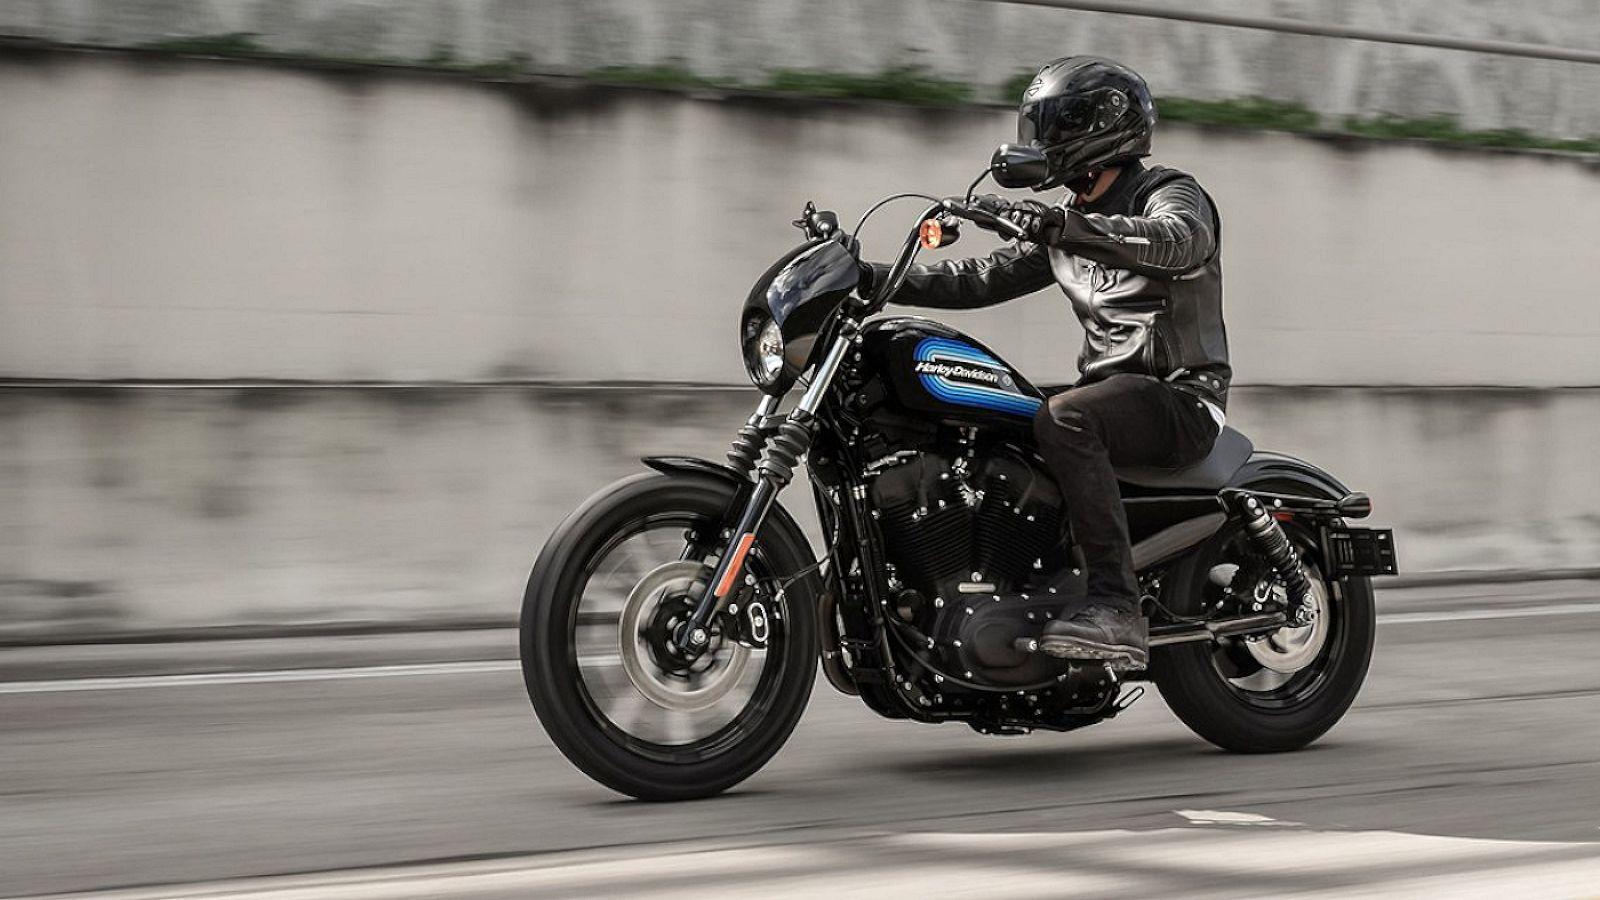 2018 2020 Harley Davidson Iron 1200 Harley Davidson Sportster